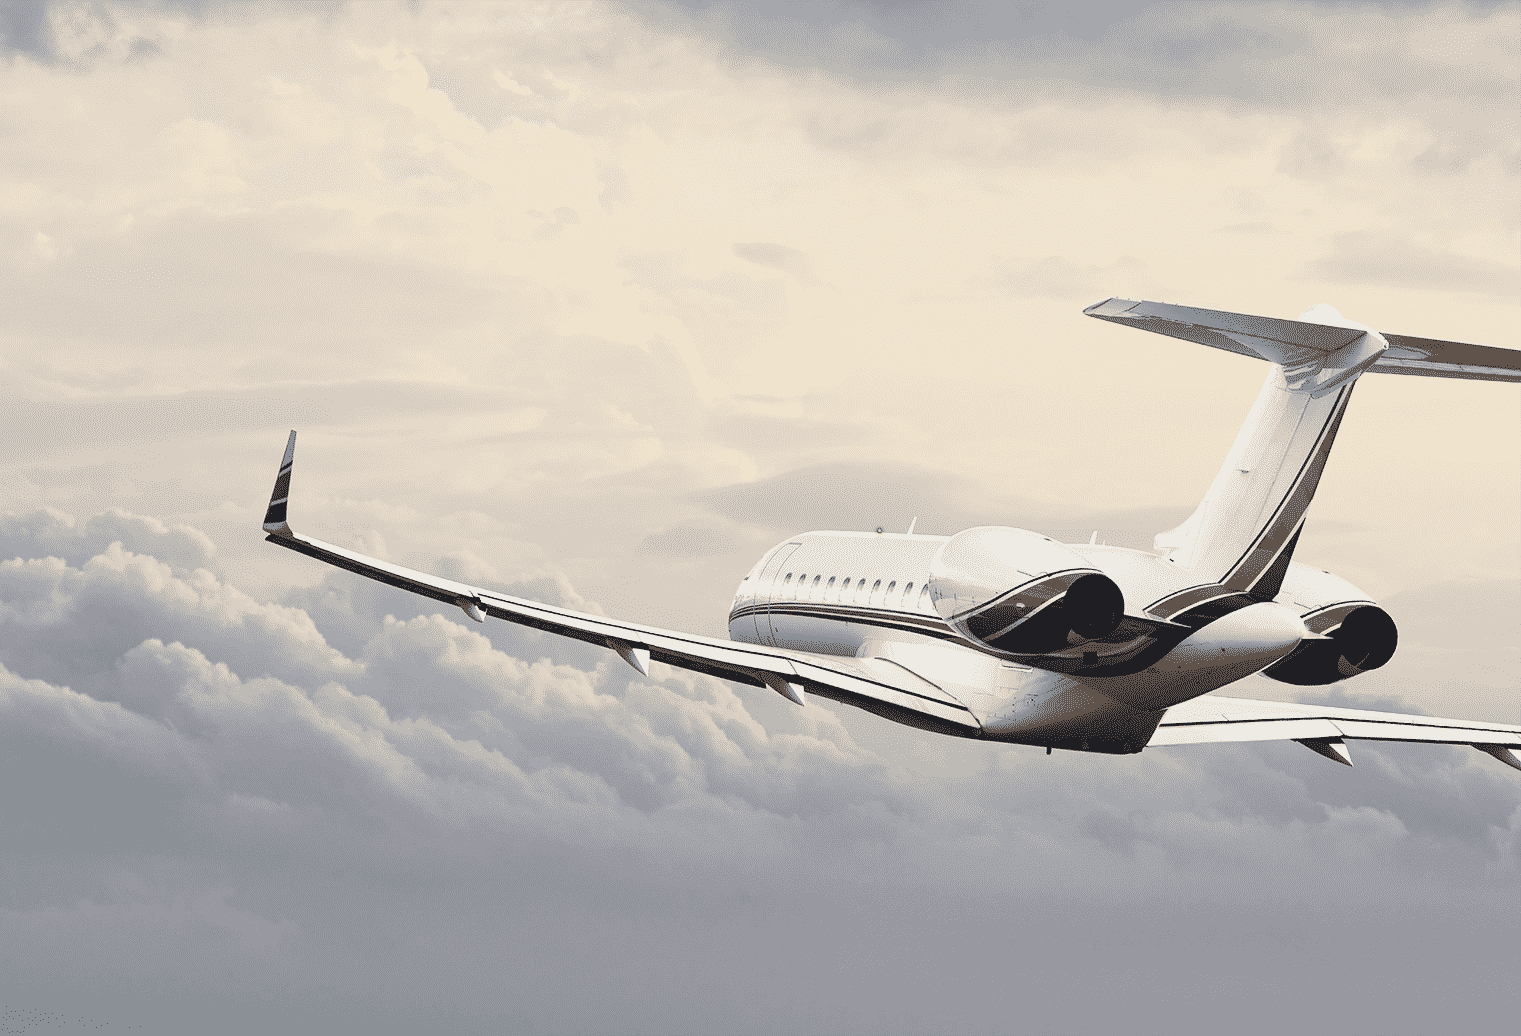 Global Jet Mid Air